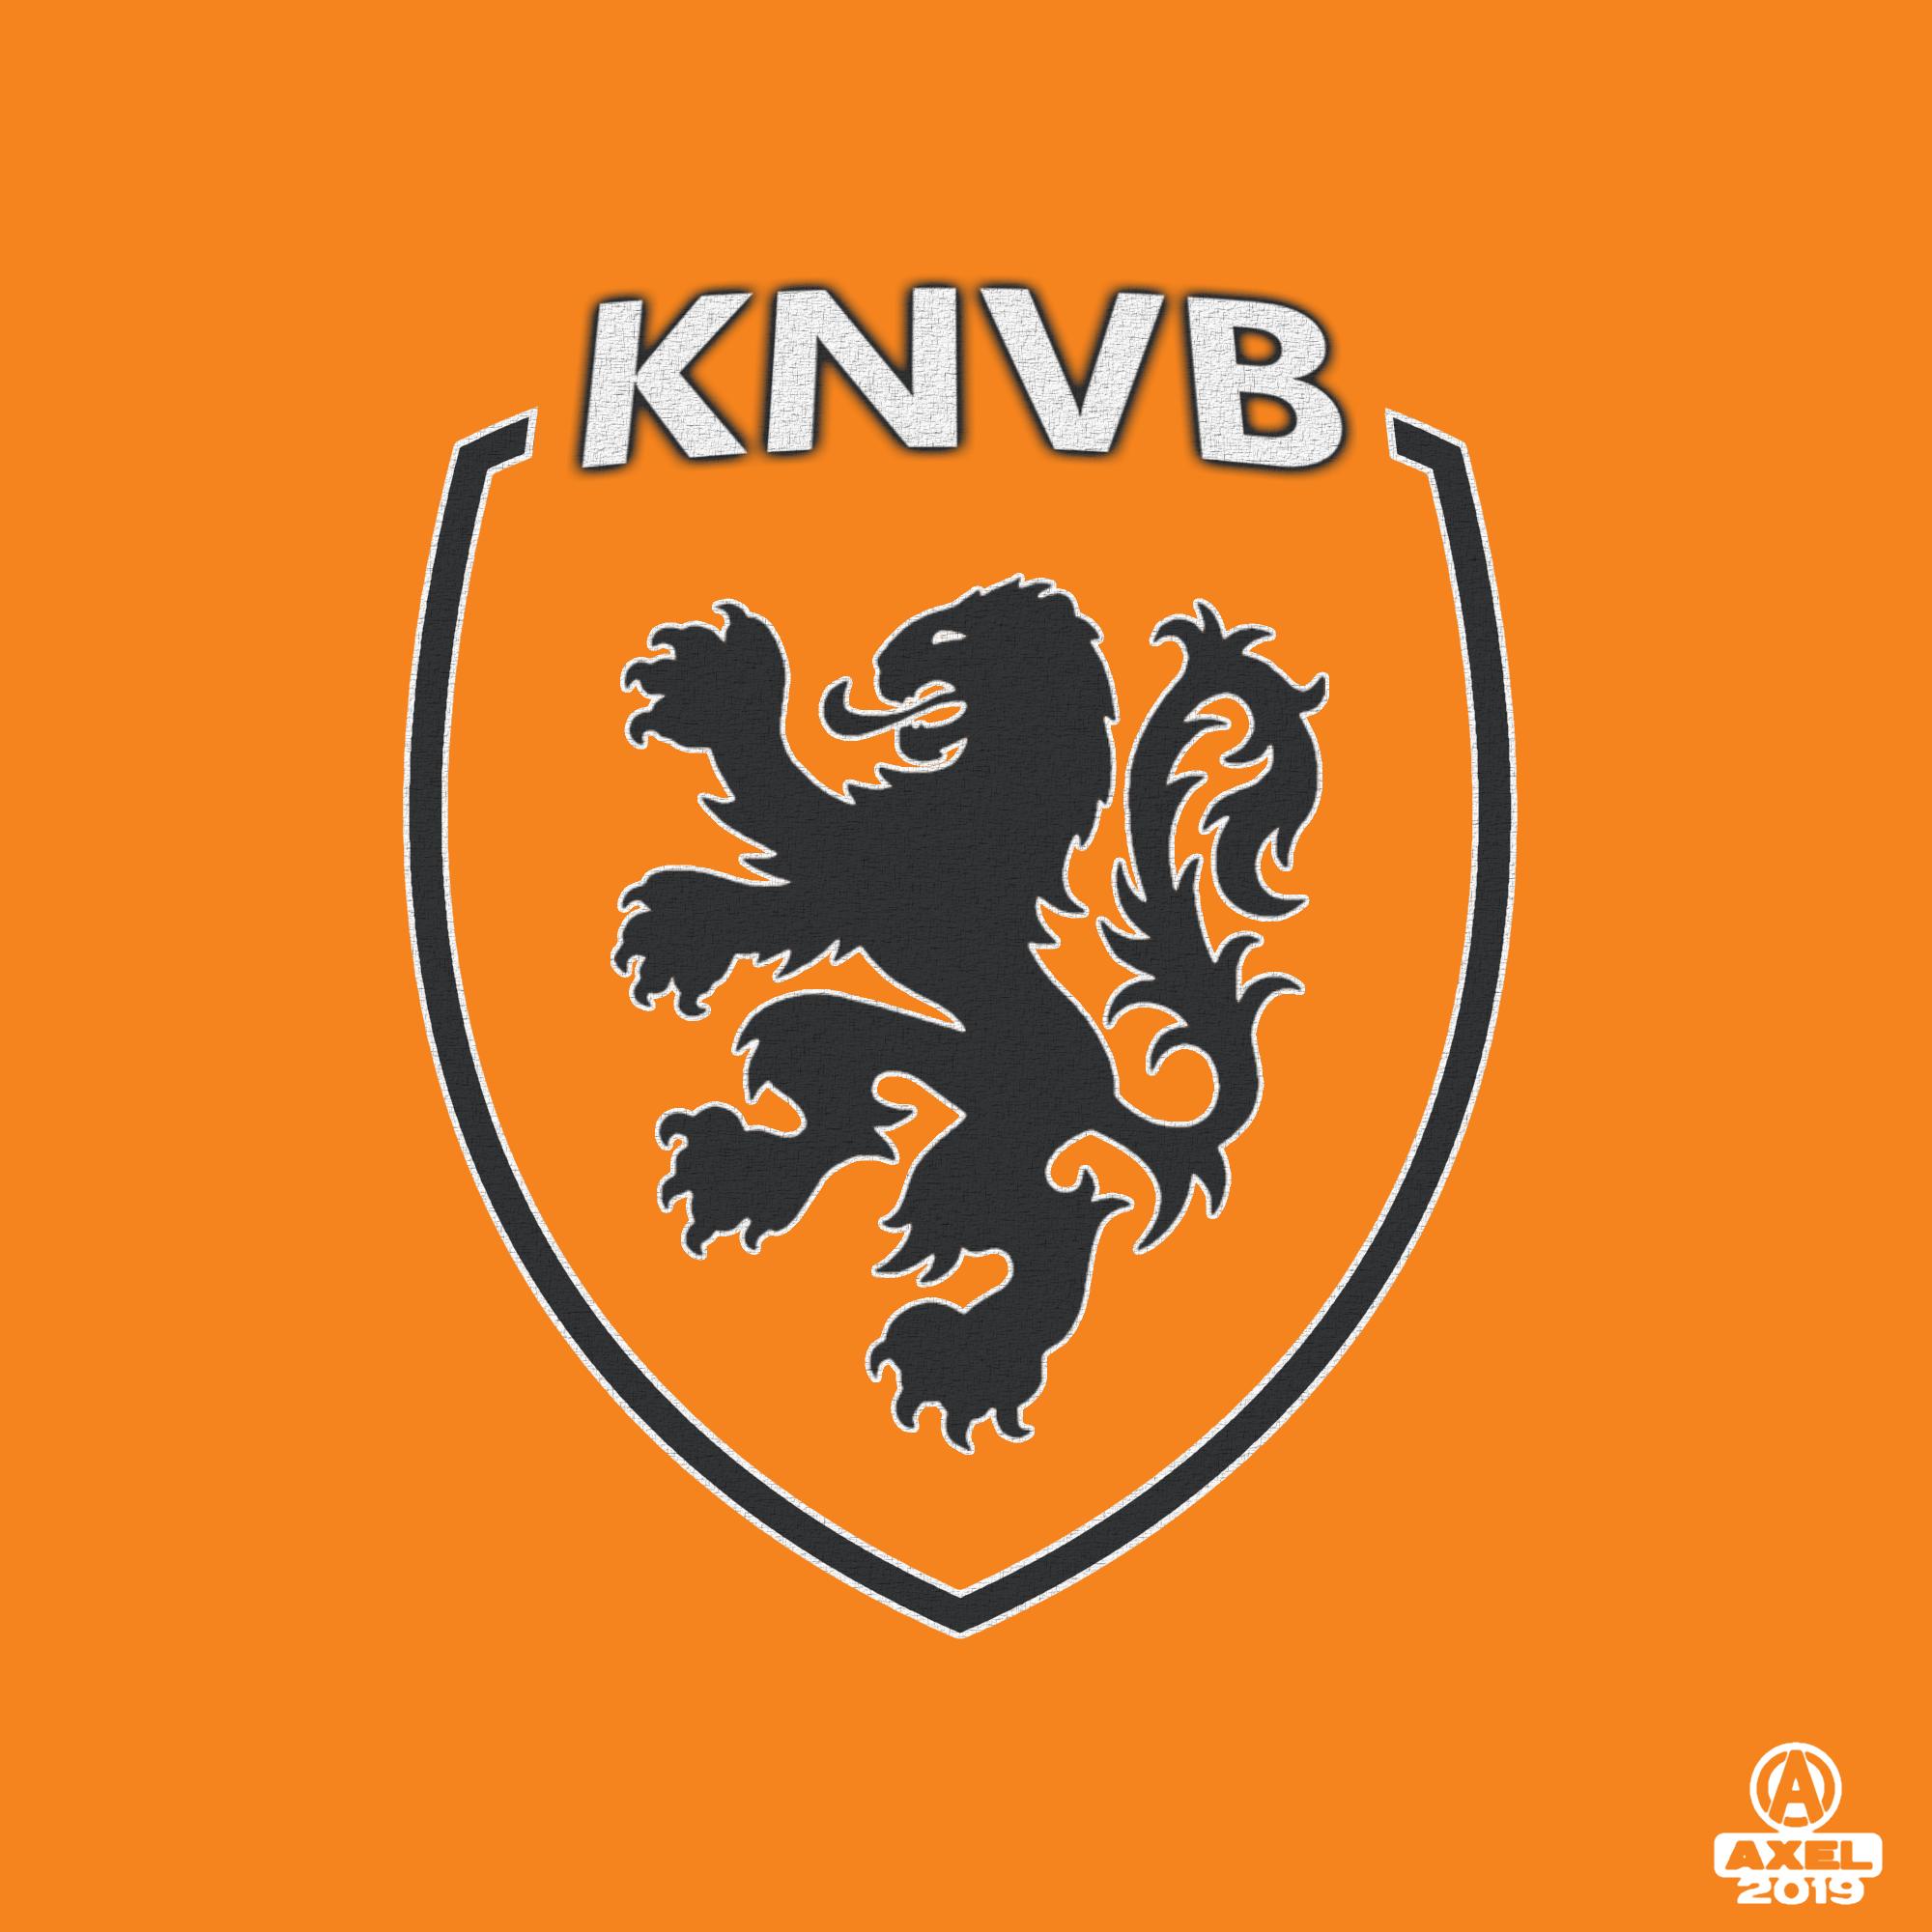 KNVB   crest redesign 2000x2000